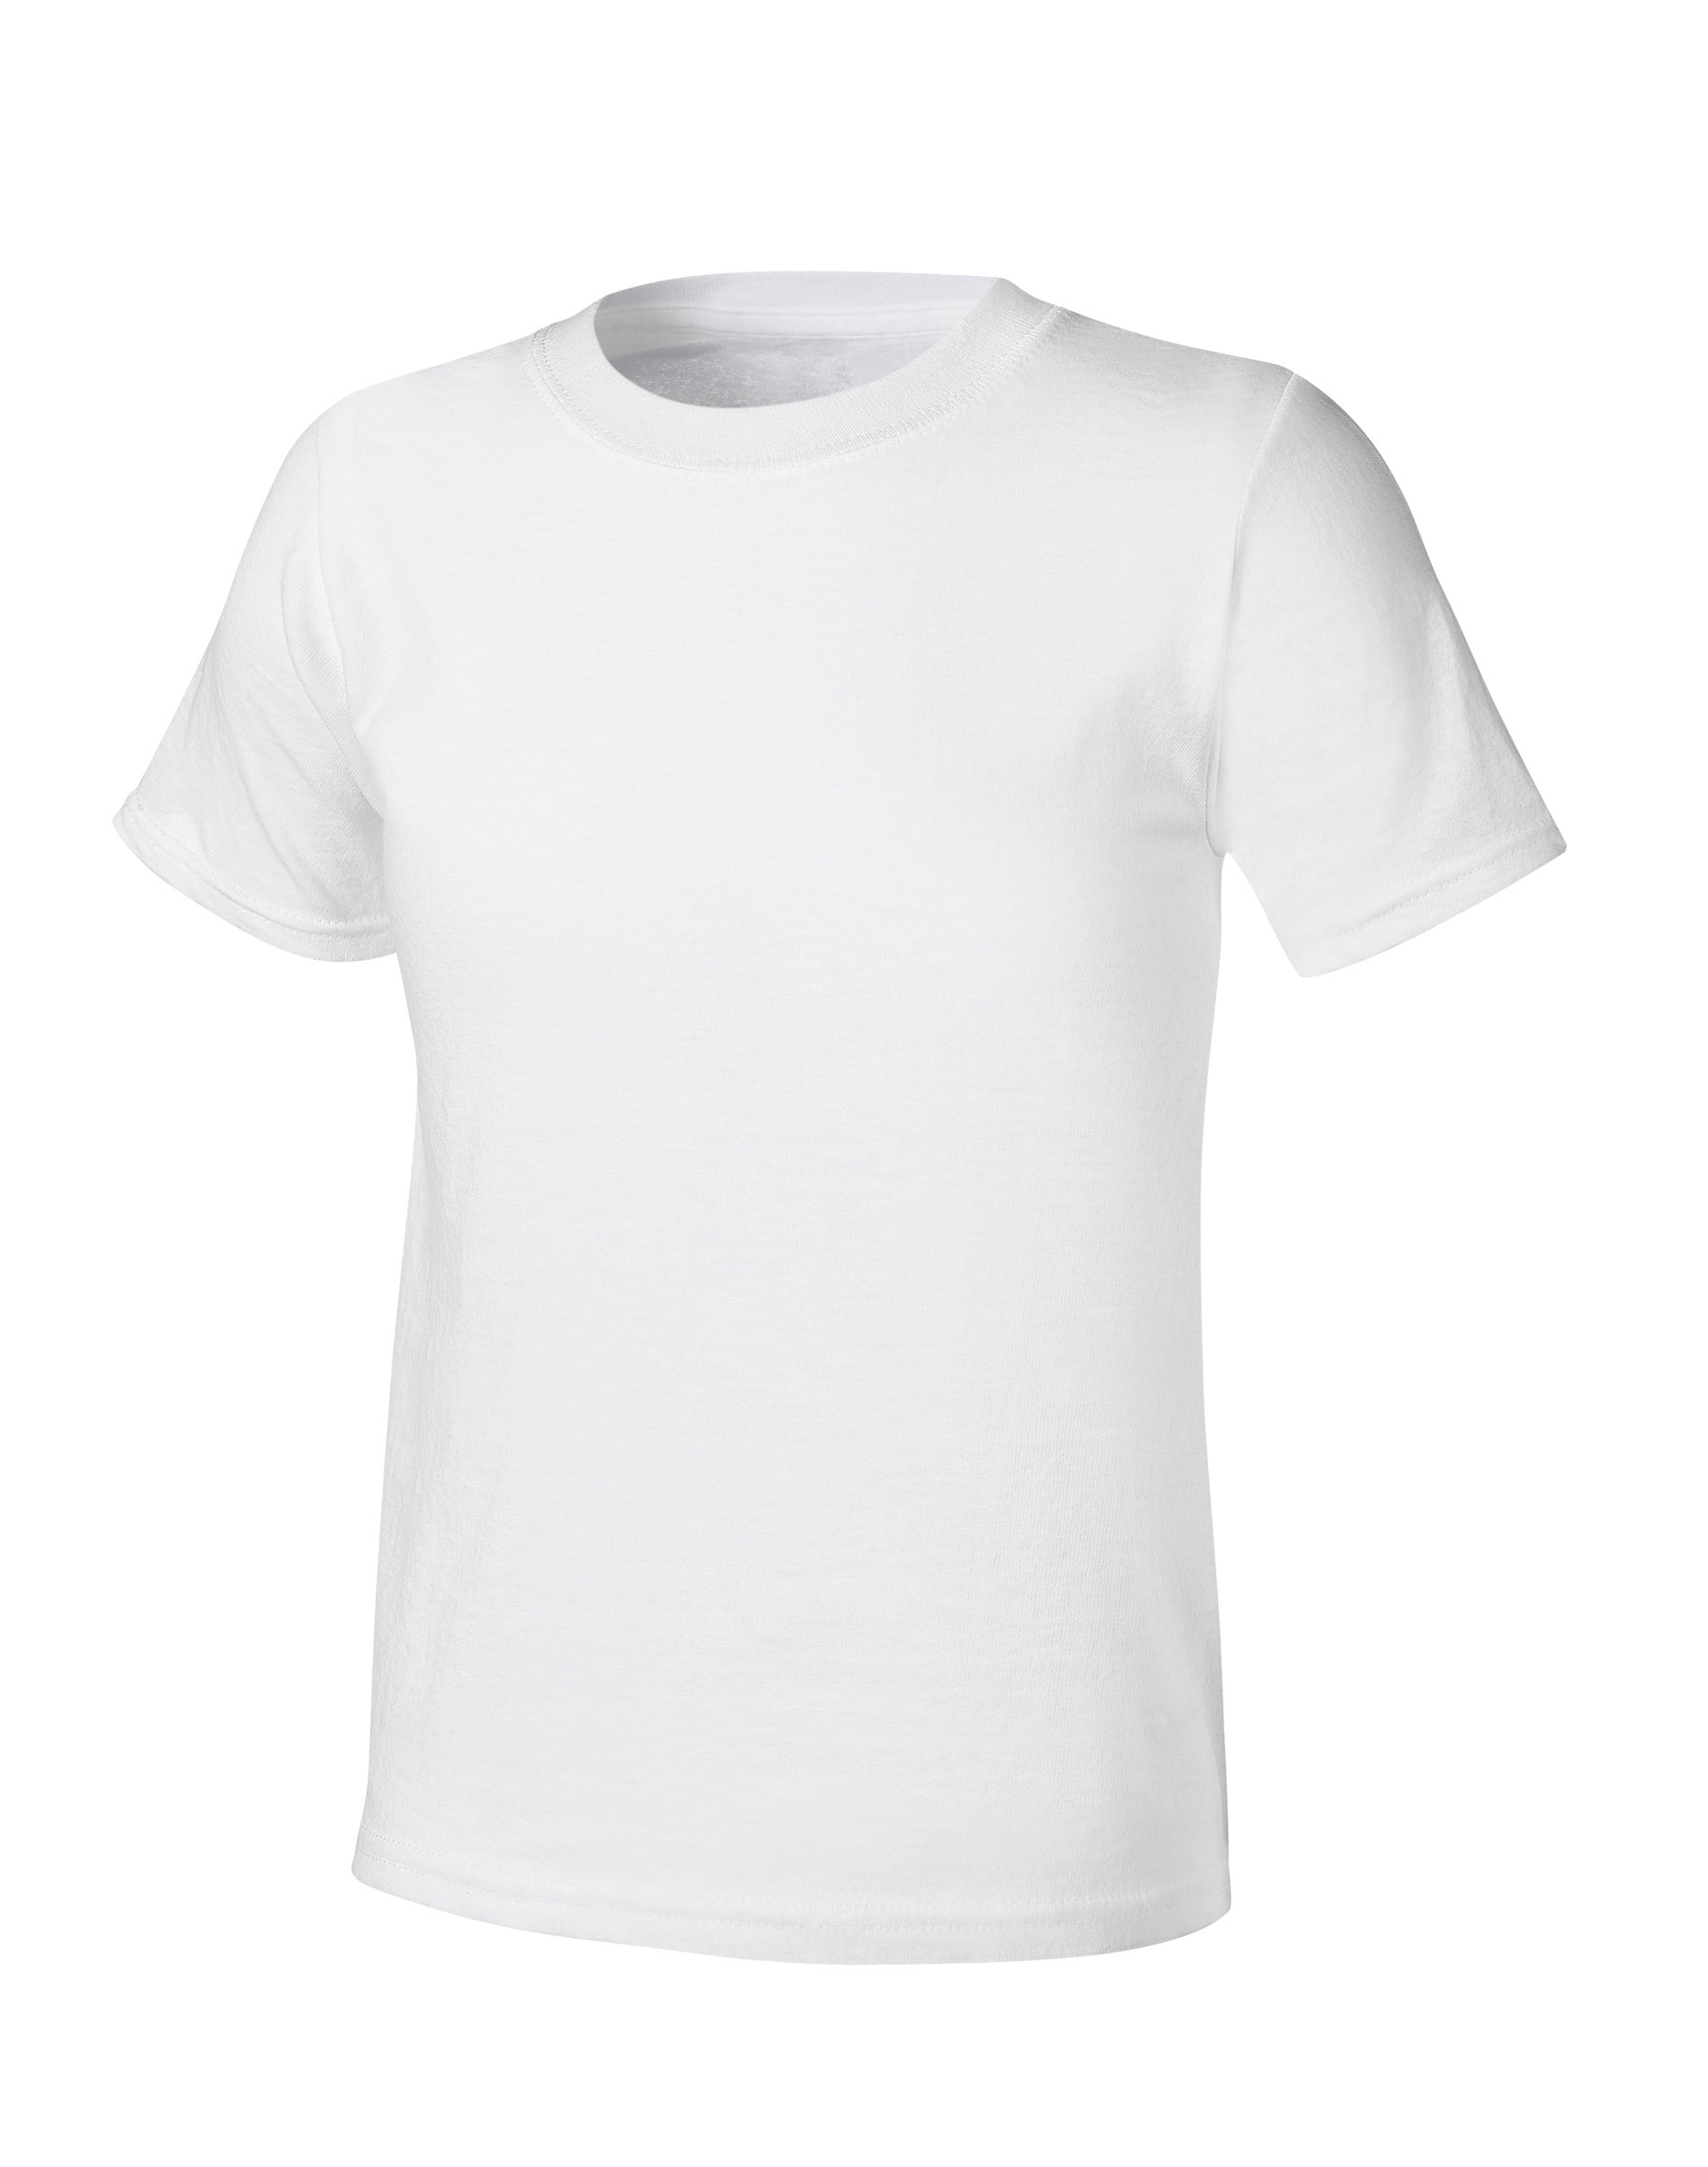 Hanes BoysUltimate X-Temp Tagless White Crew 4-Pack